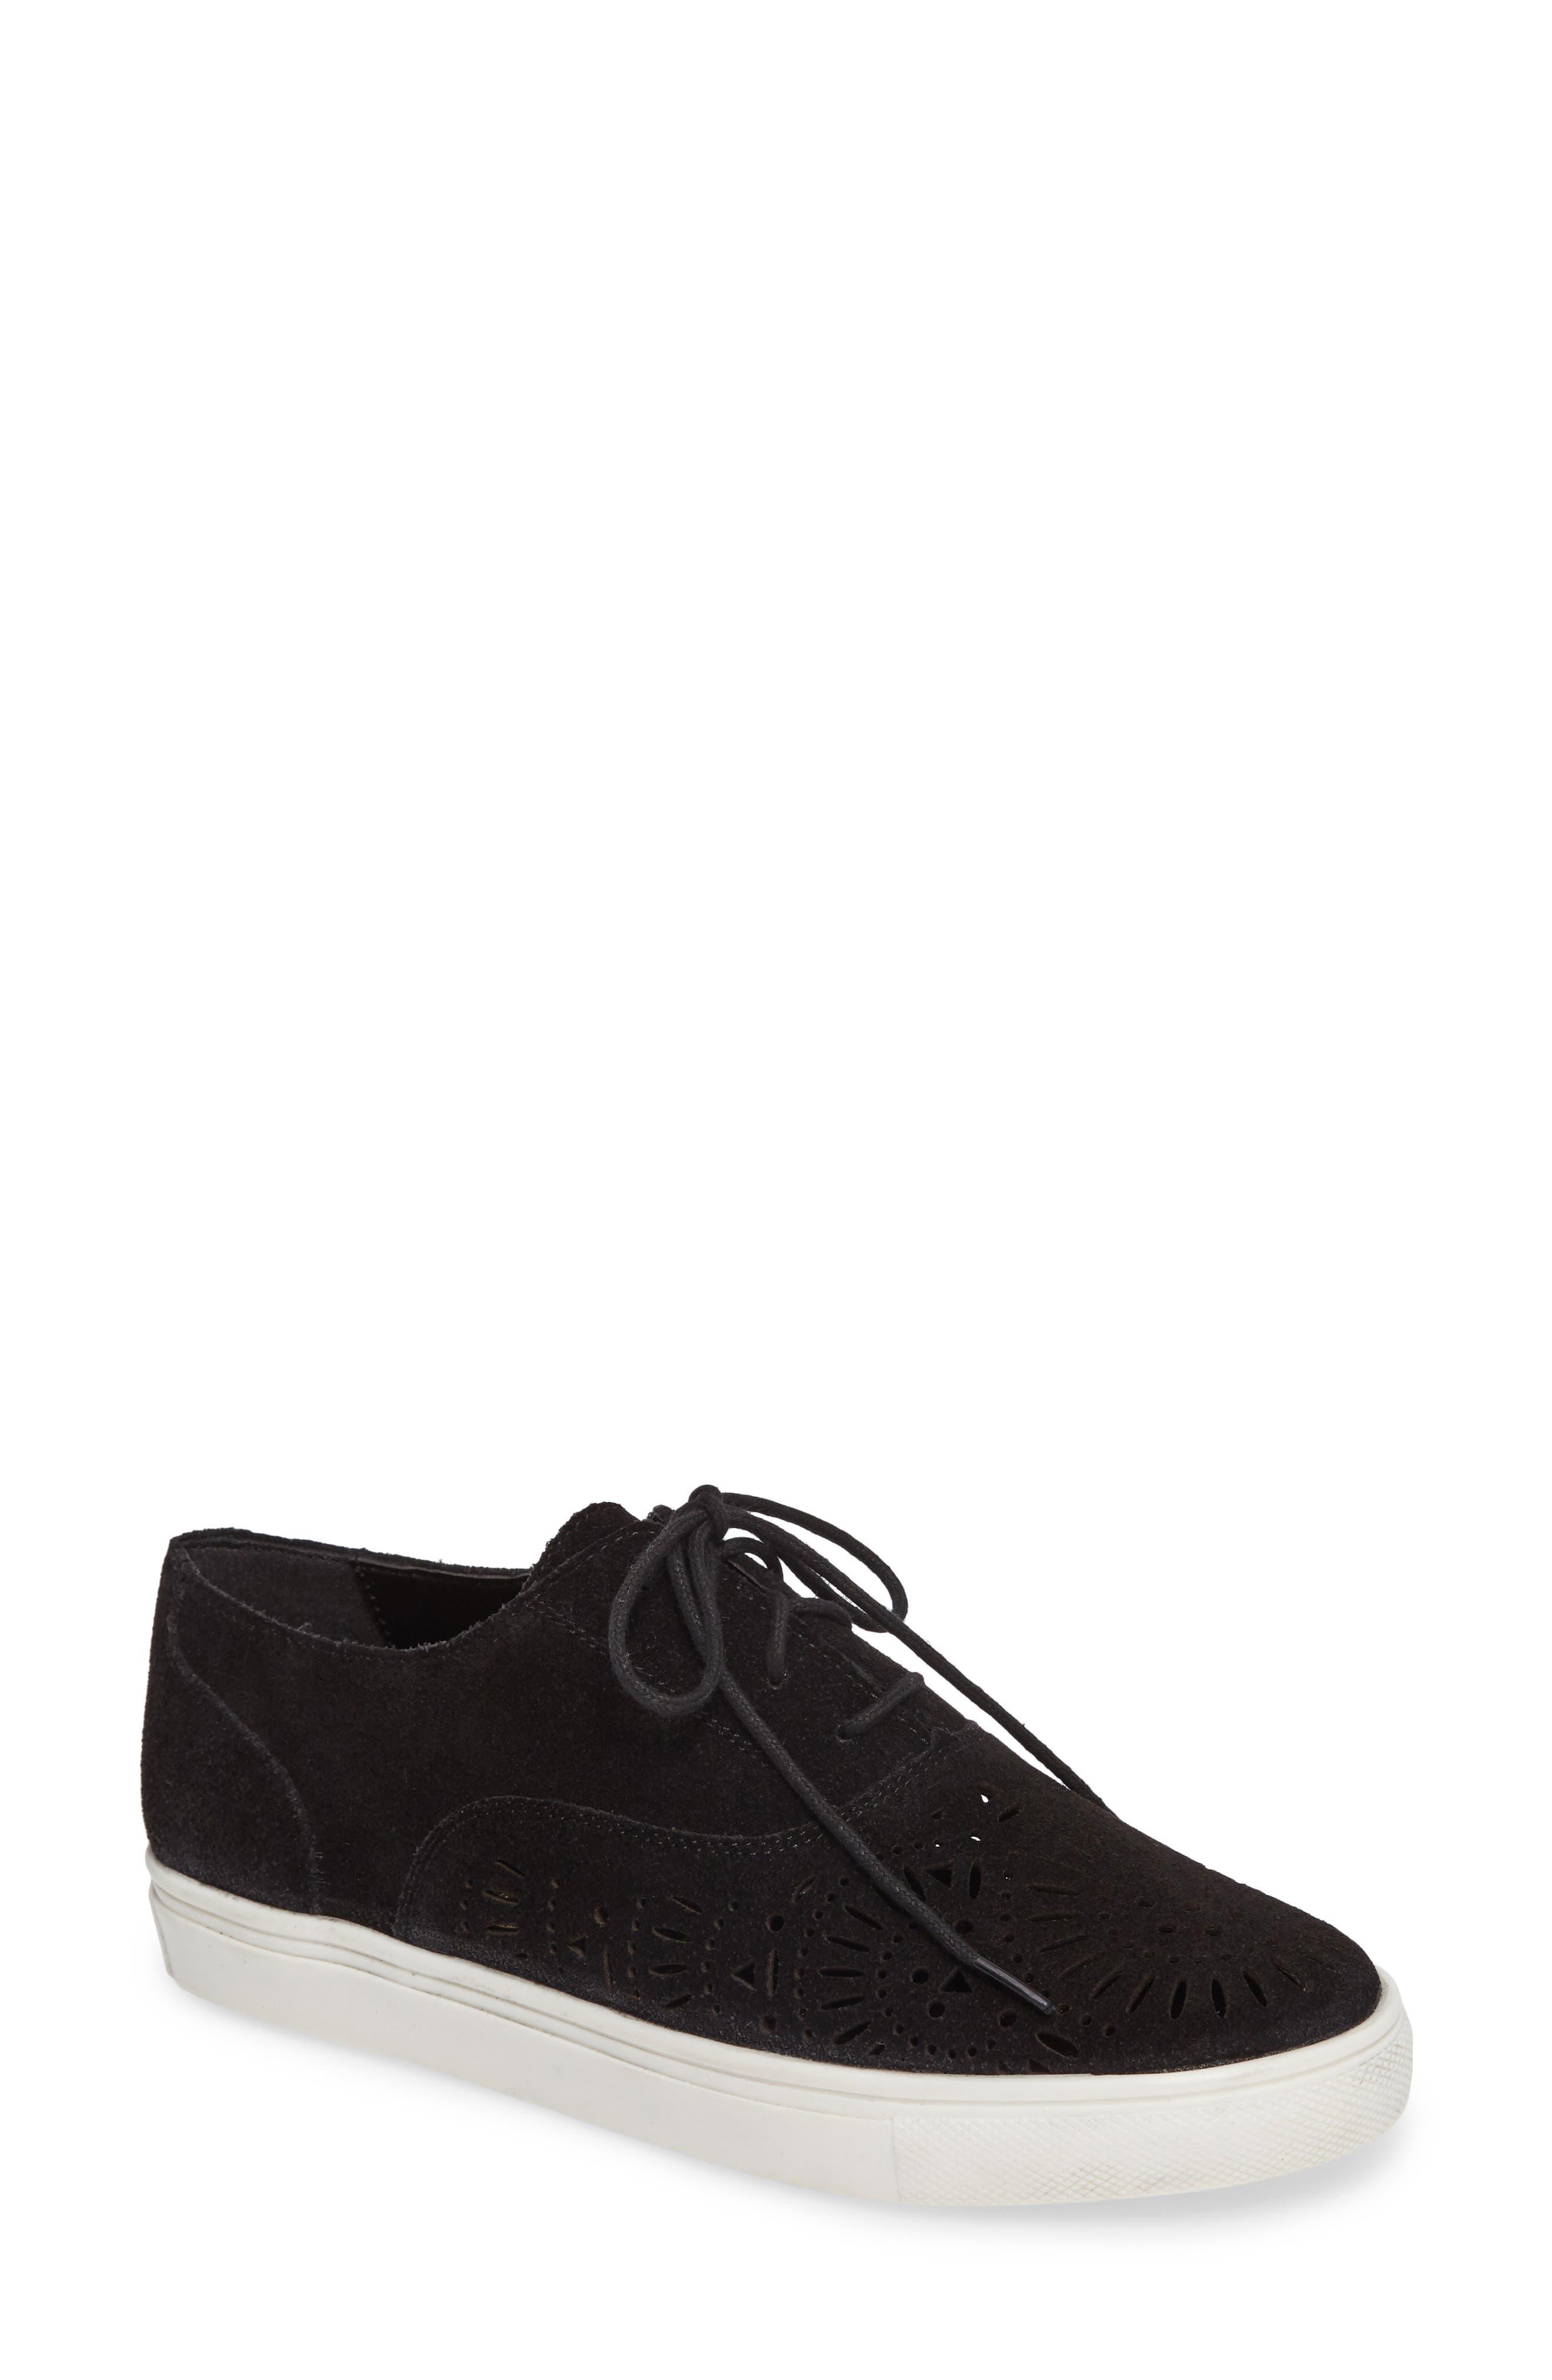 Kaleidoscope Sneaker,                             Main thumbnail 1, color,                             001